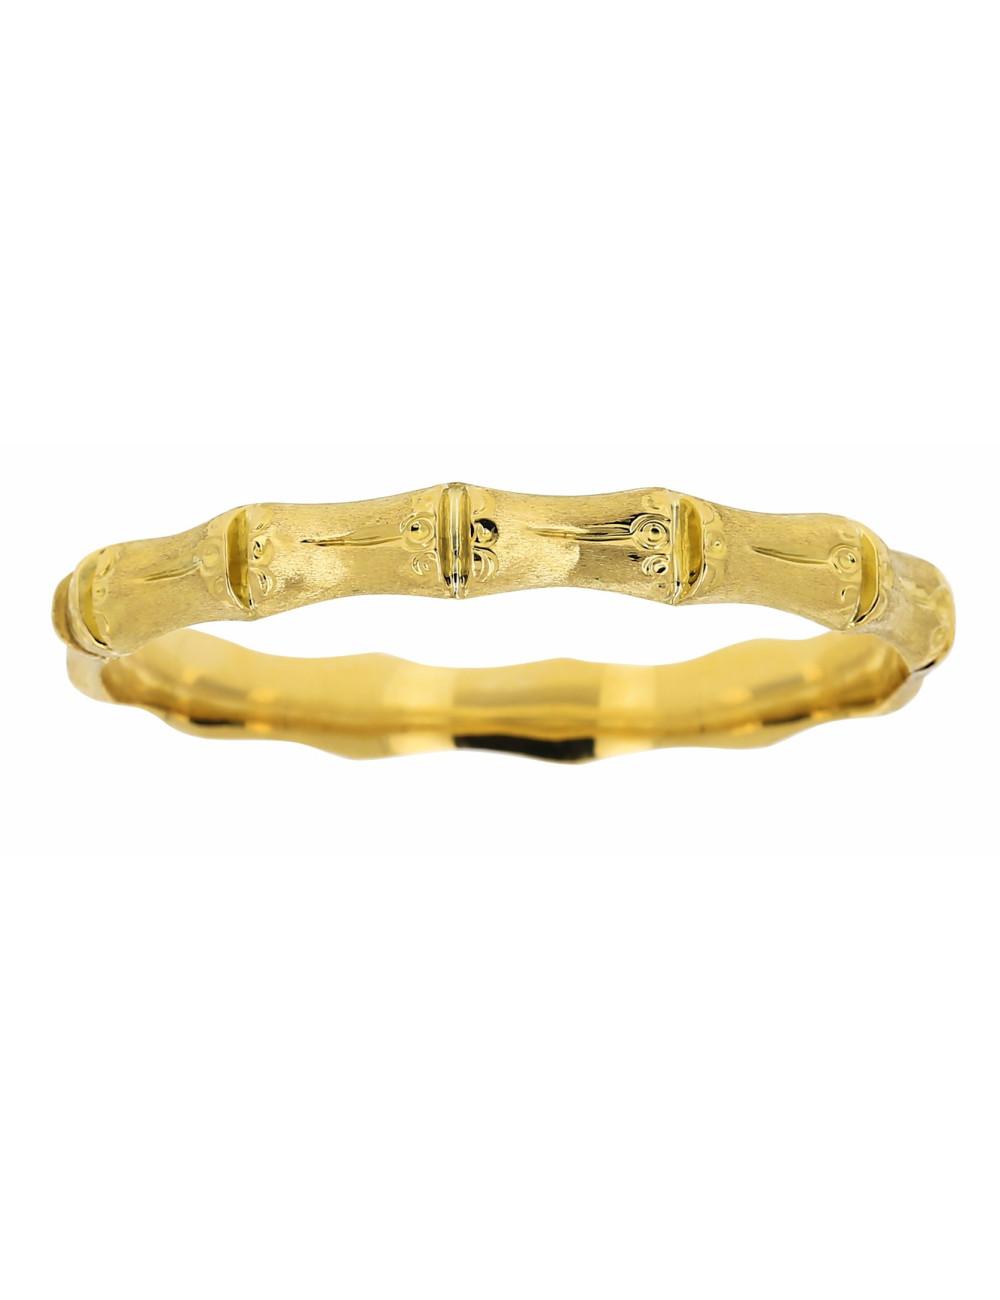 Bracelet Maille Bambou Or Jaune 18 Carats